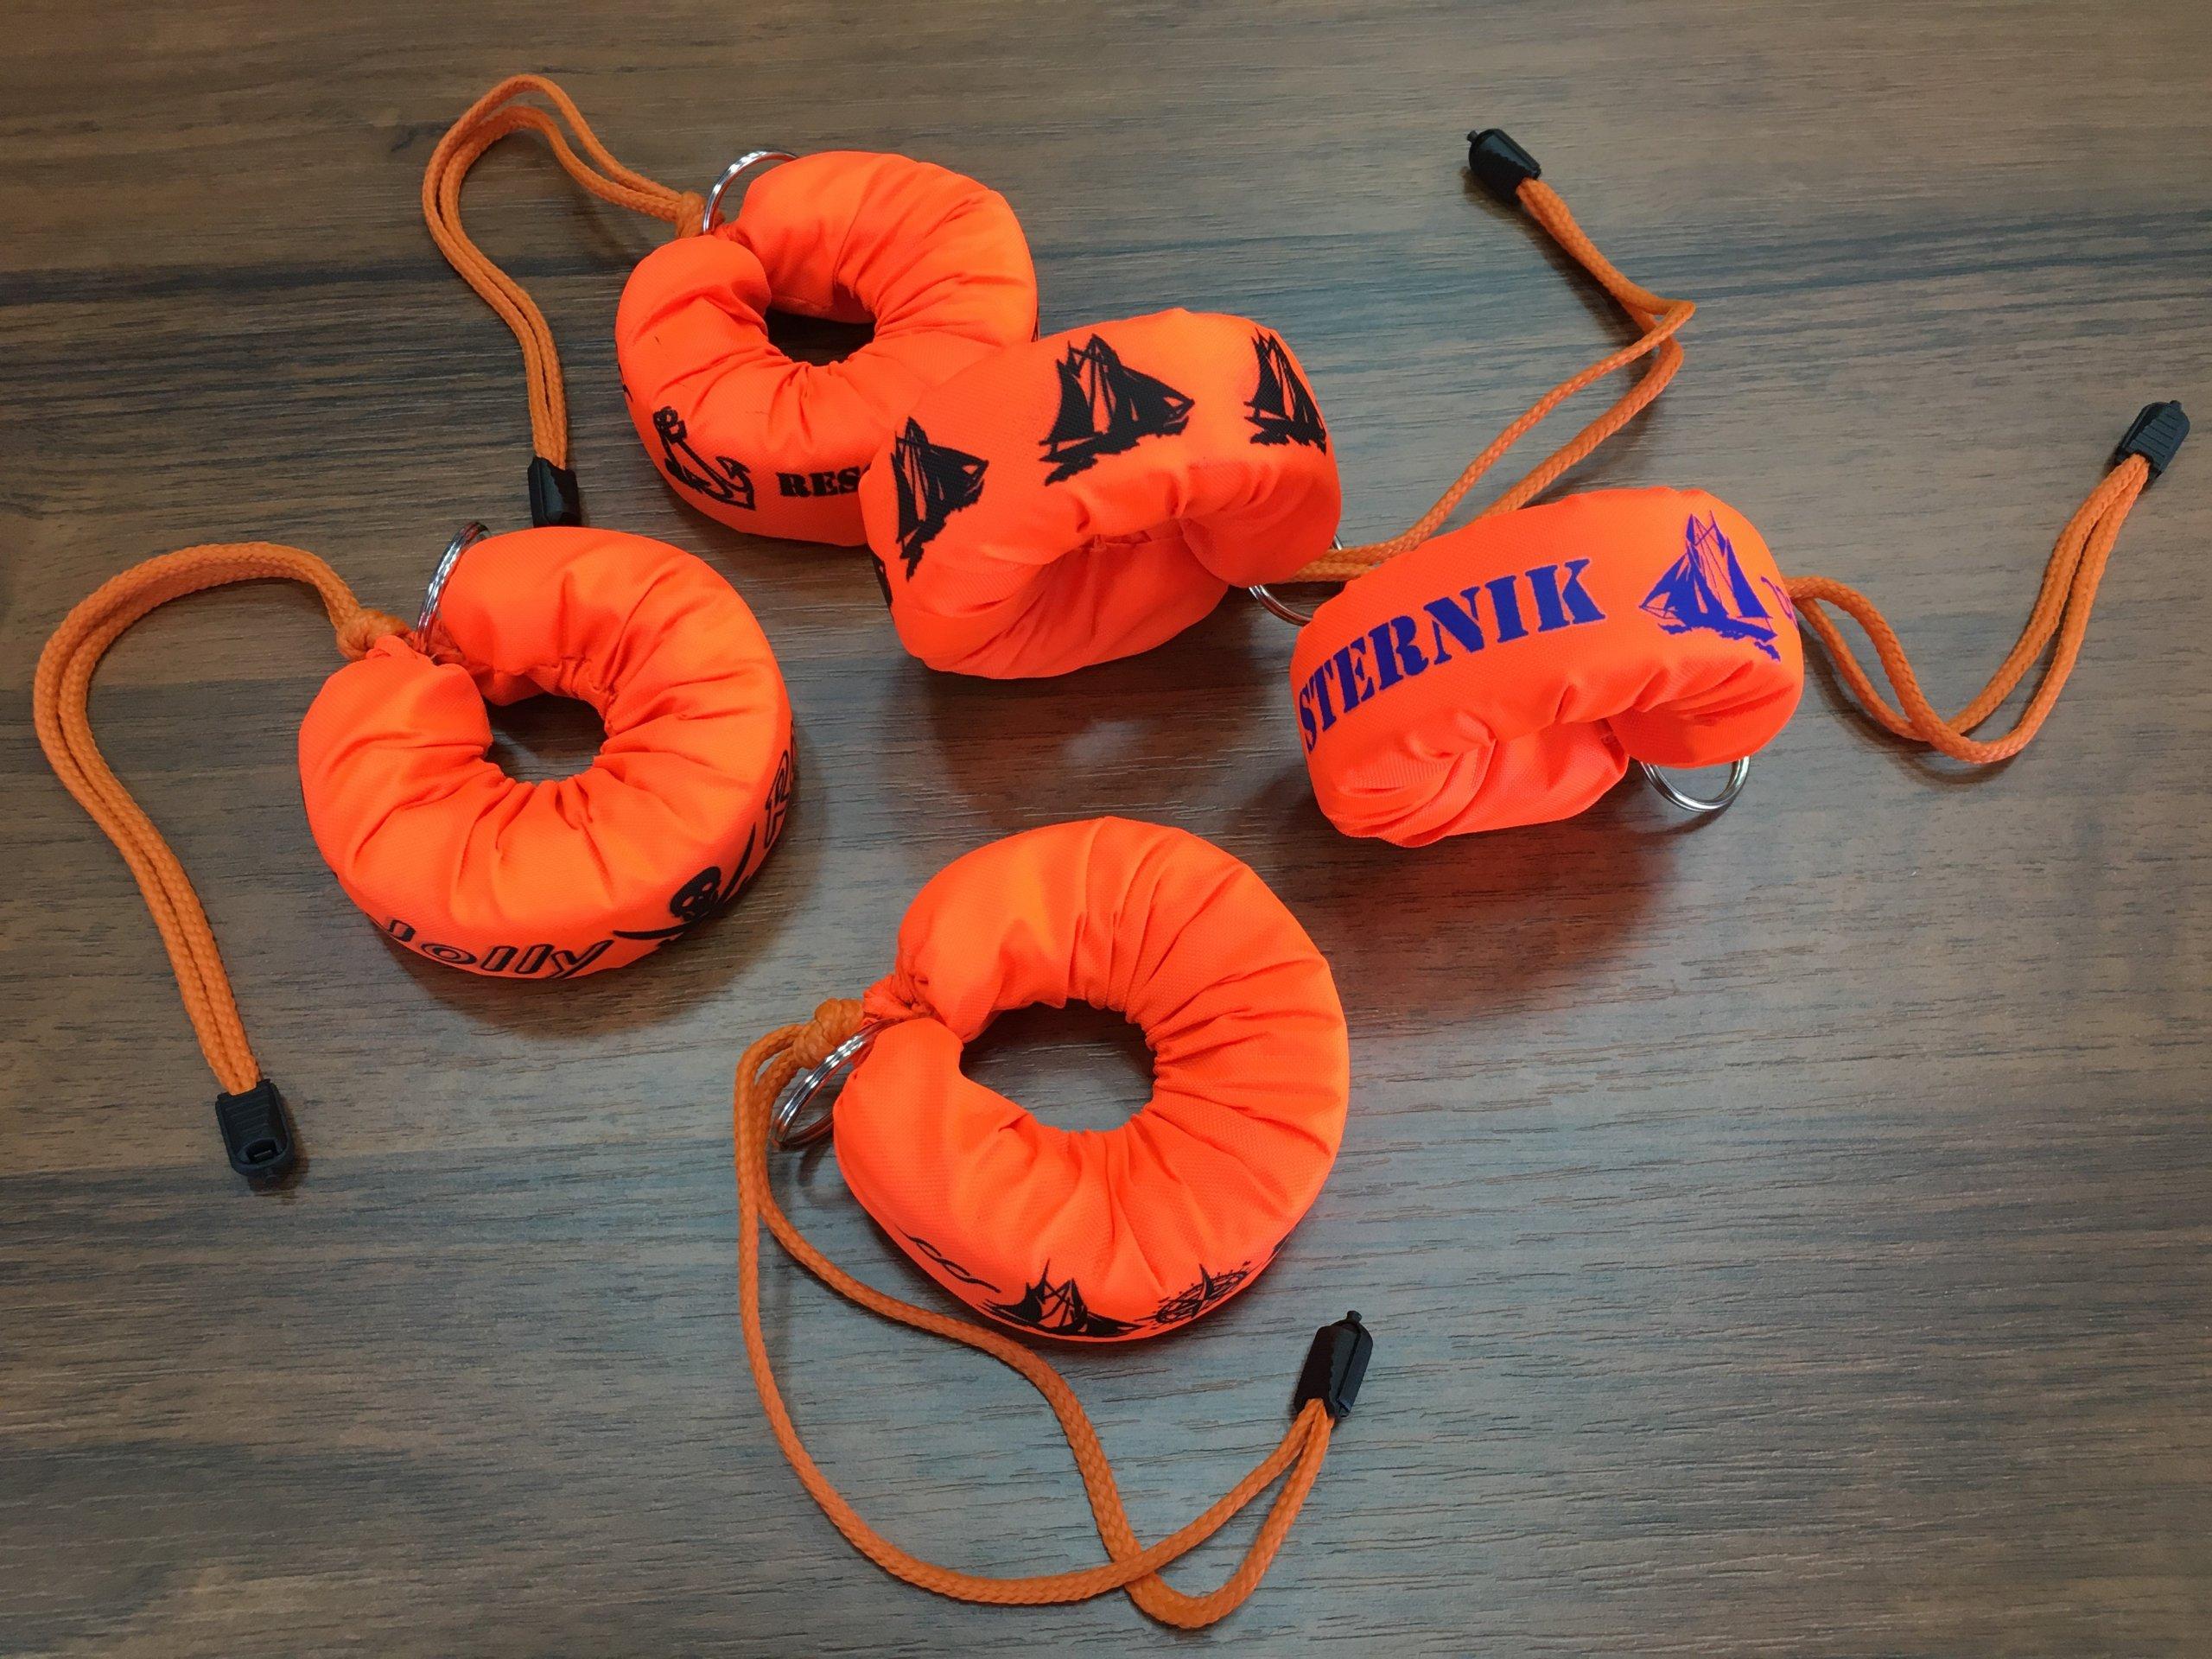 Plávajúci keychain typu Lifebuoy